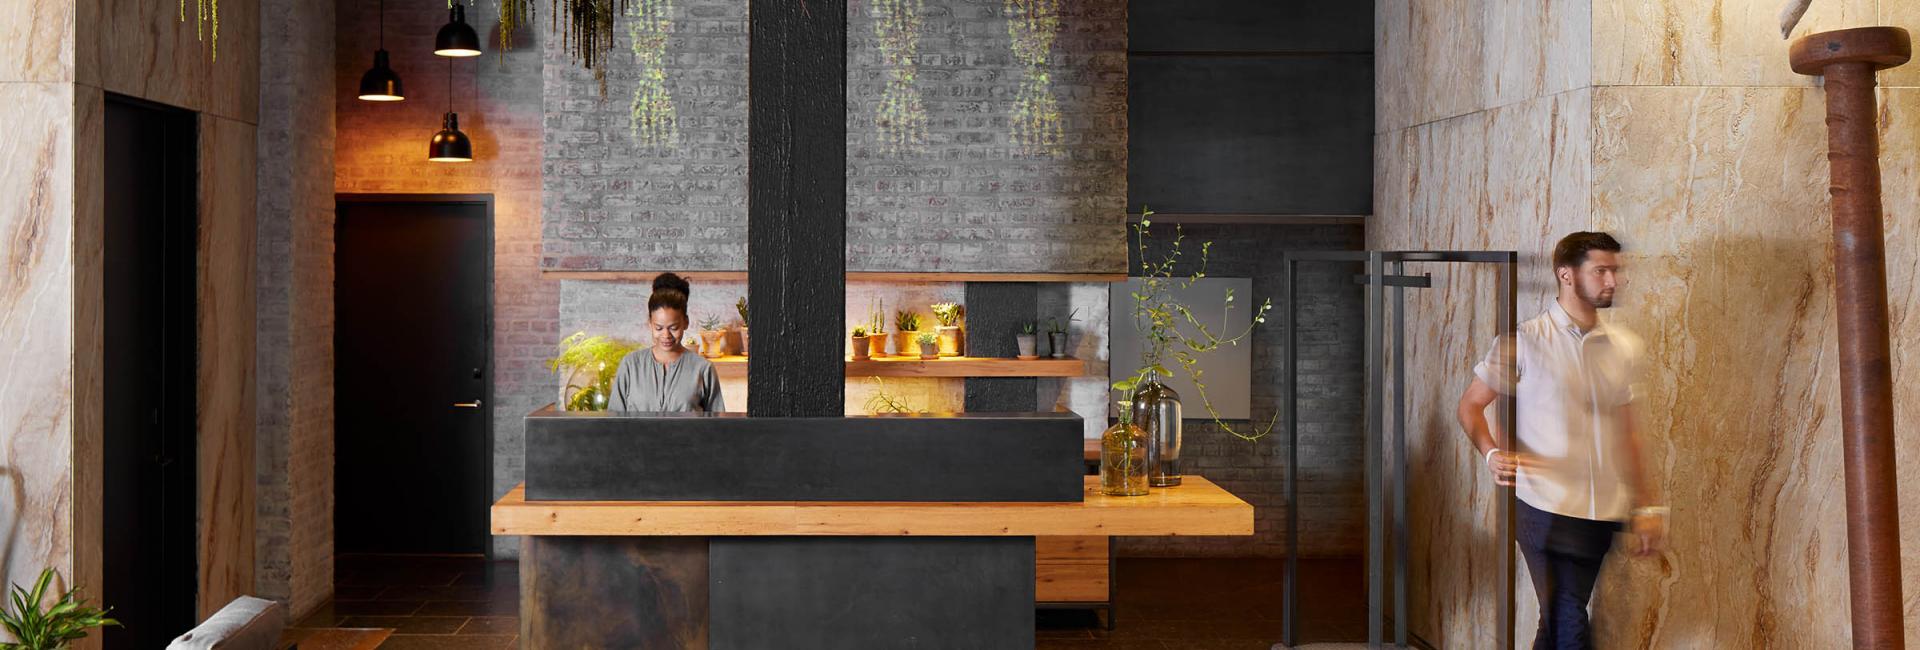 Careers | SH Hotels & Resorts